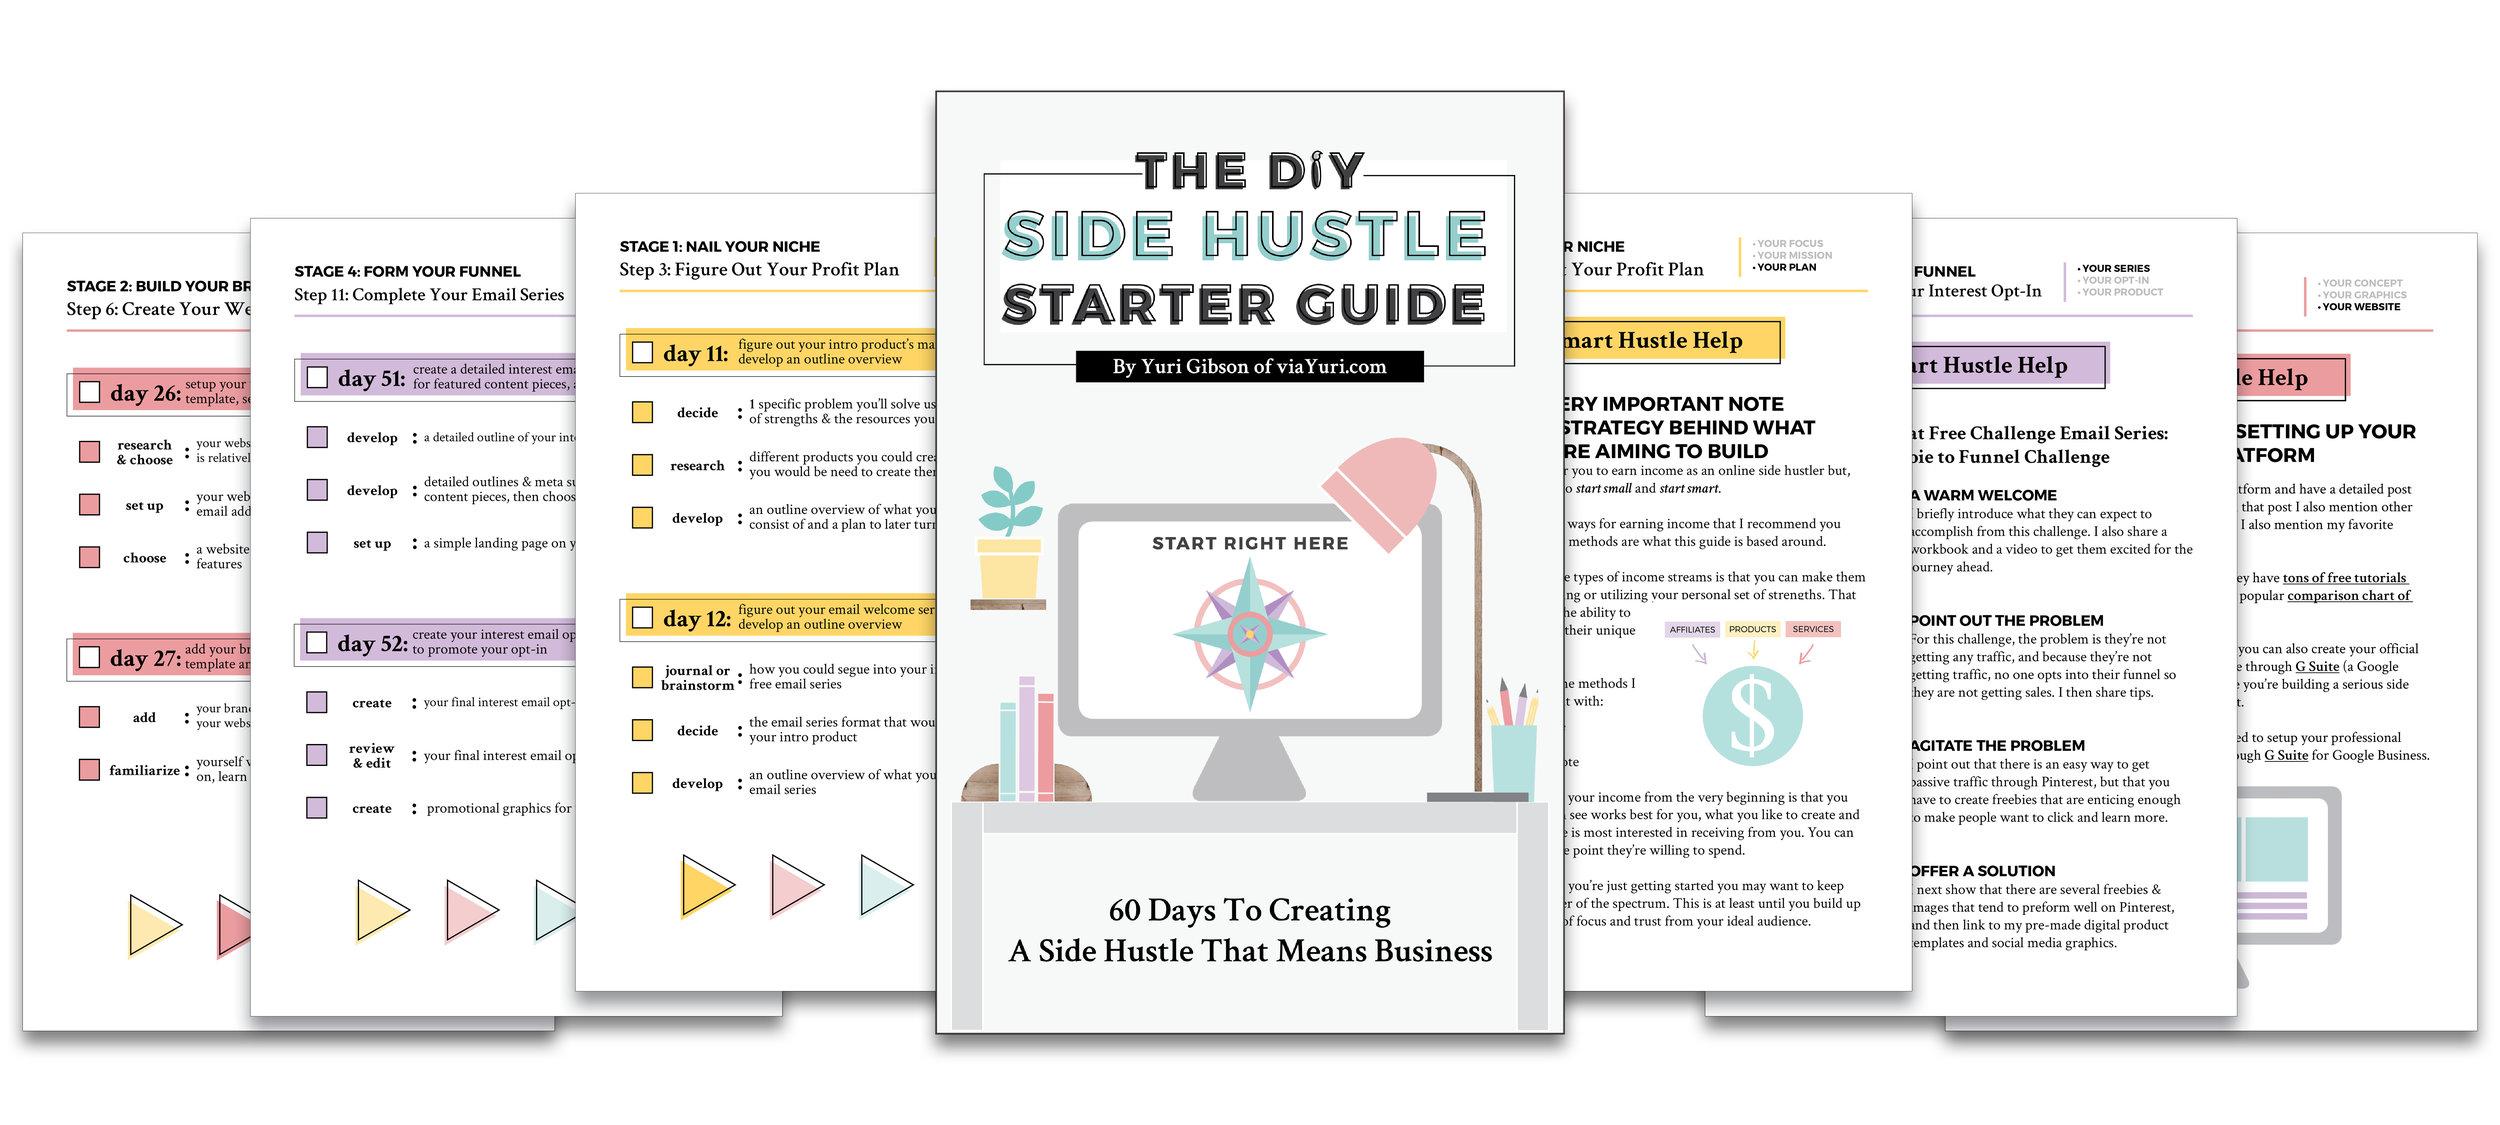 What's Inside: The DIY Side Hustle Starter Guide by Yuri Gibson of viaYuri.com